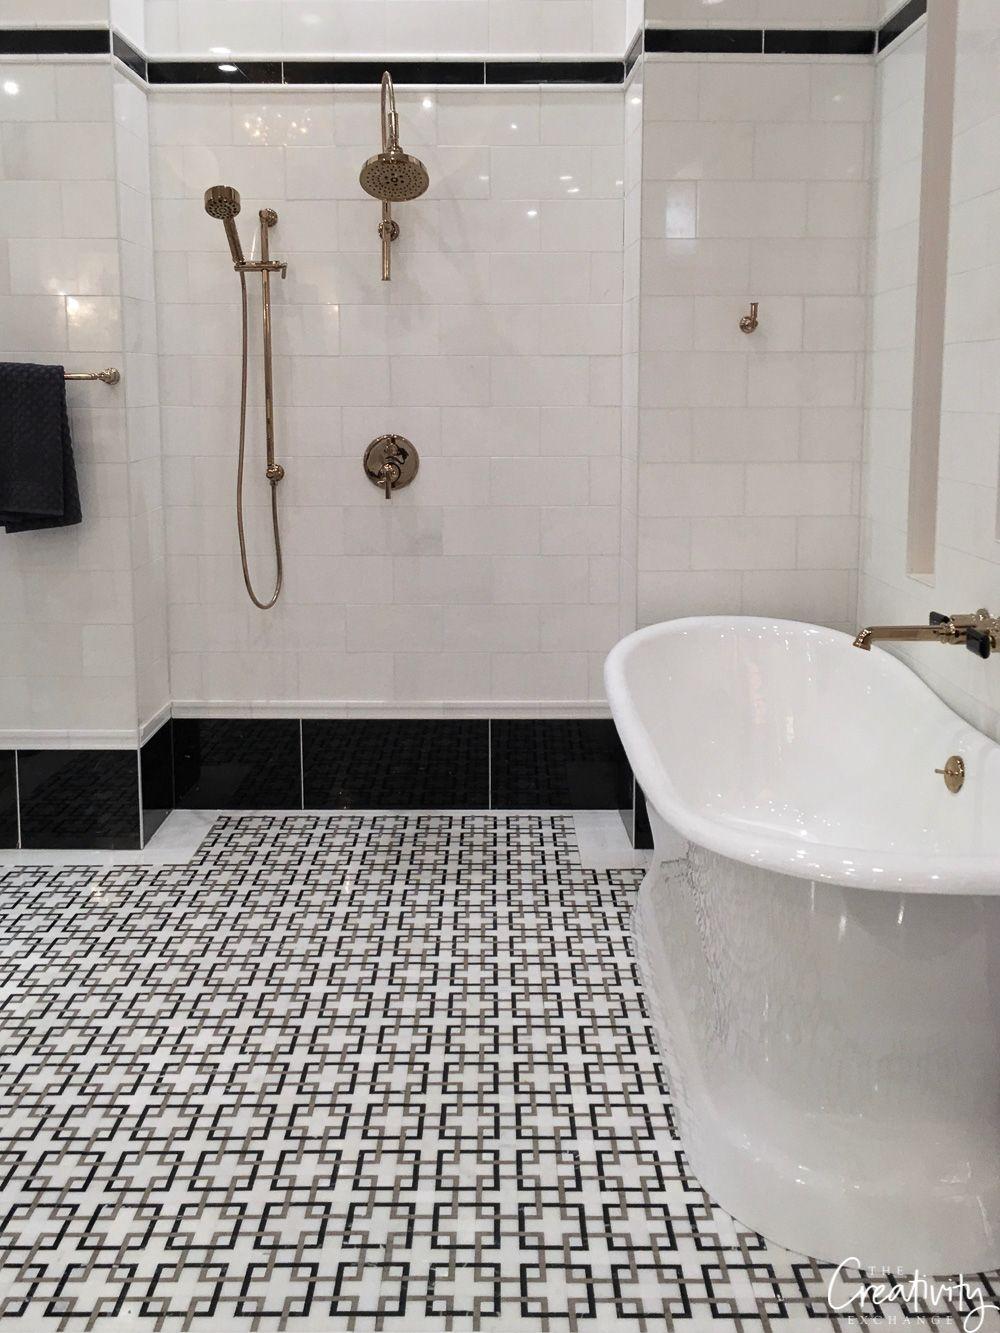 2019 Kitchen And Bath Industry Show In Las Vegas Marble Bathroom Mosaic Bathroom Bathroom Wallpaper